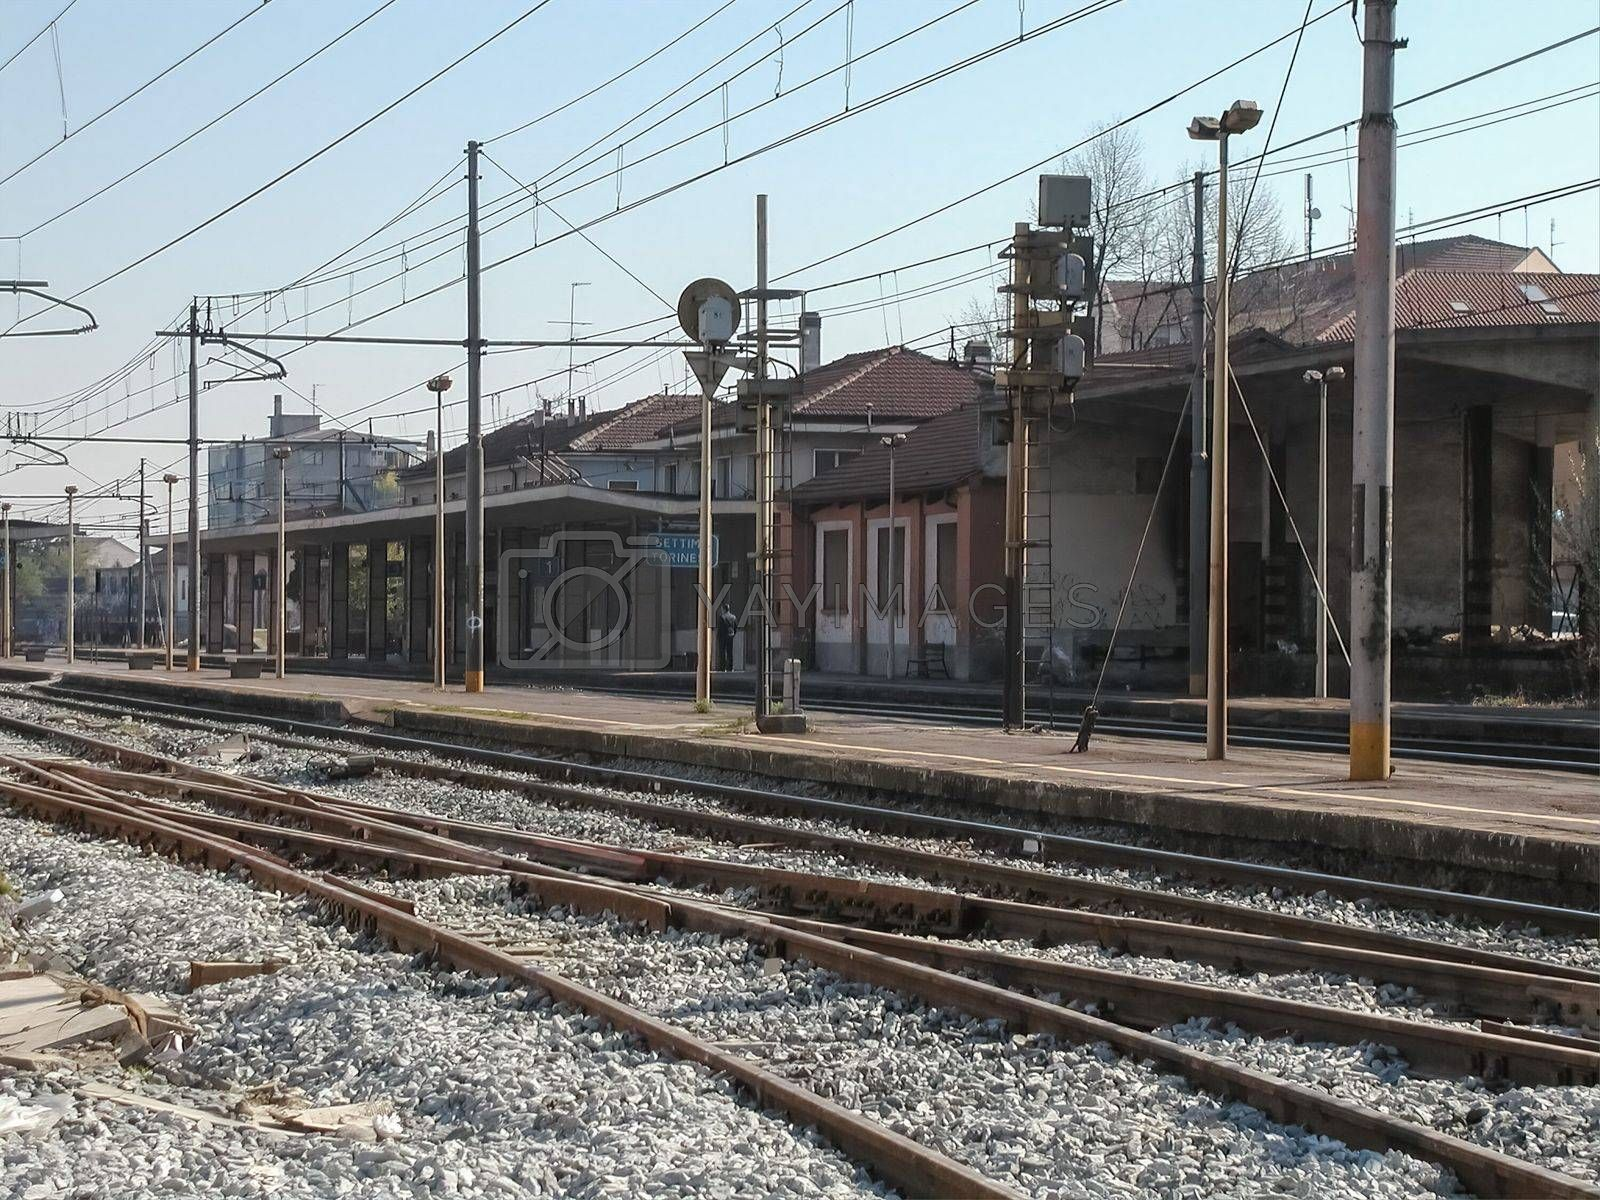 Train station in Settimo Torinese by claudiodivizia